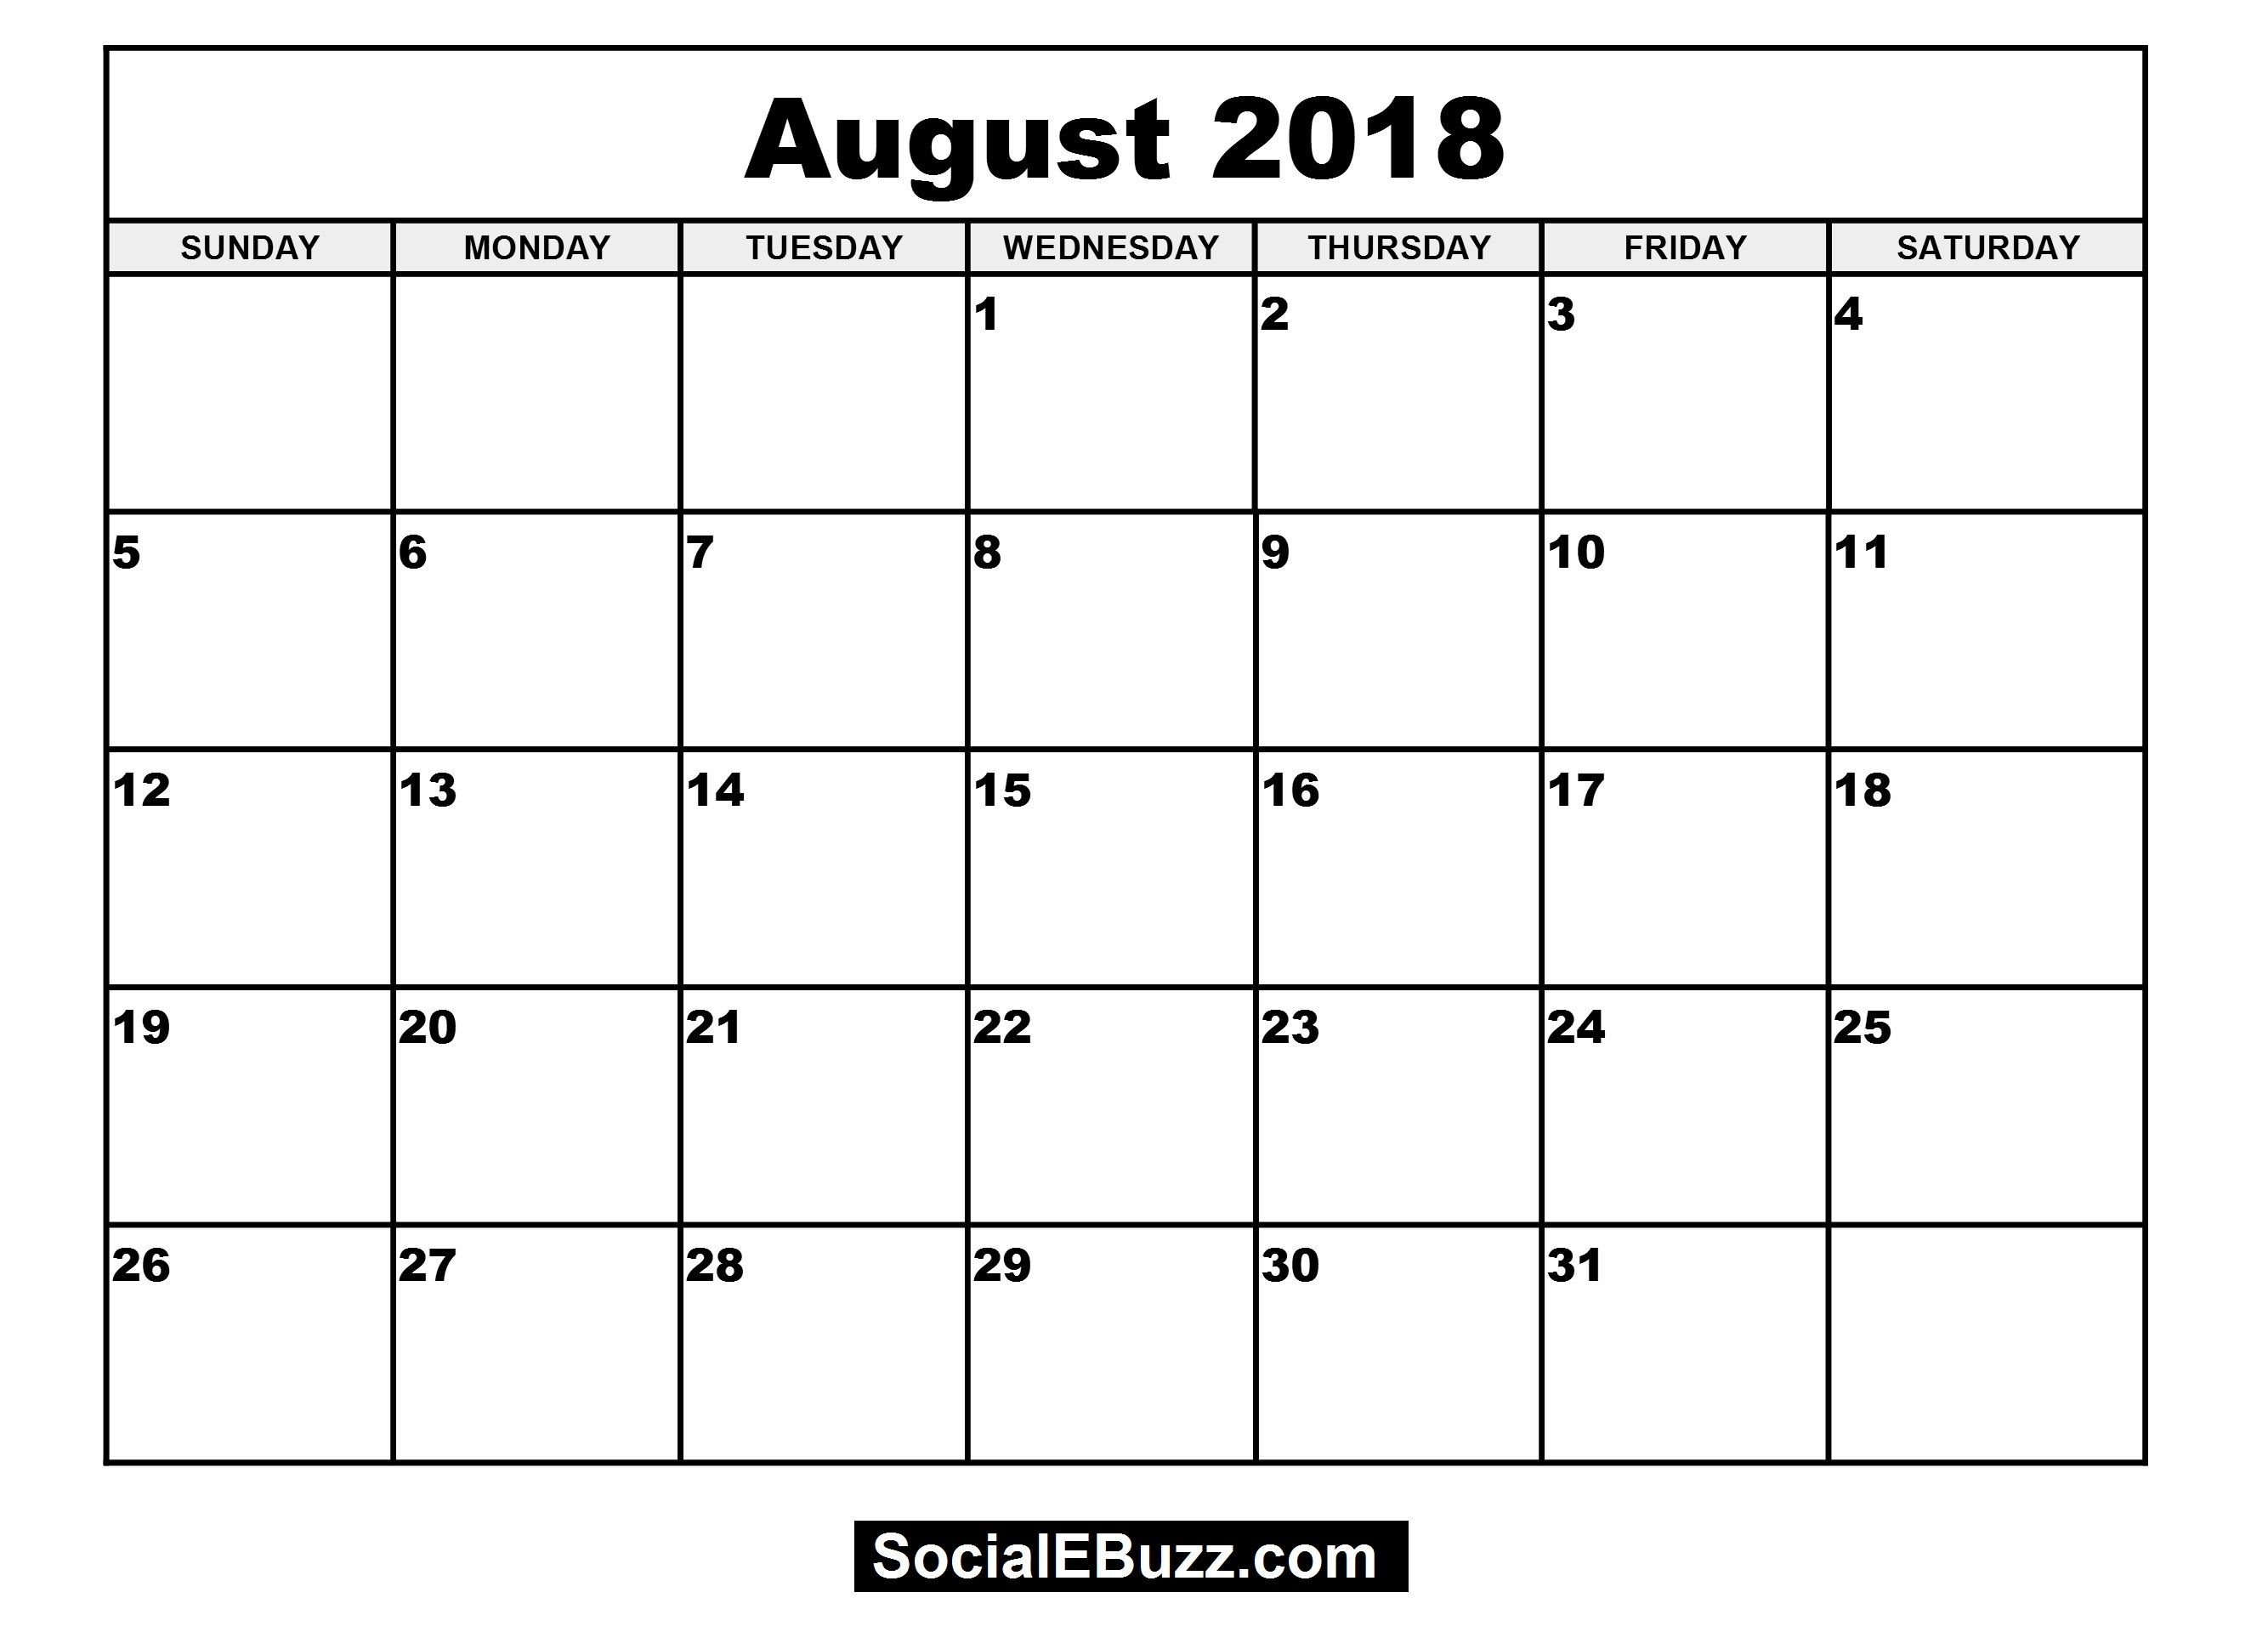 Pincalendar Printable On August 2018 Calendar   2018 Calendar intended for Blank Calender August Printable